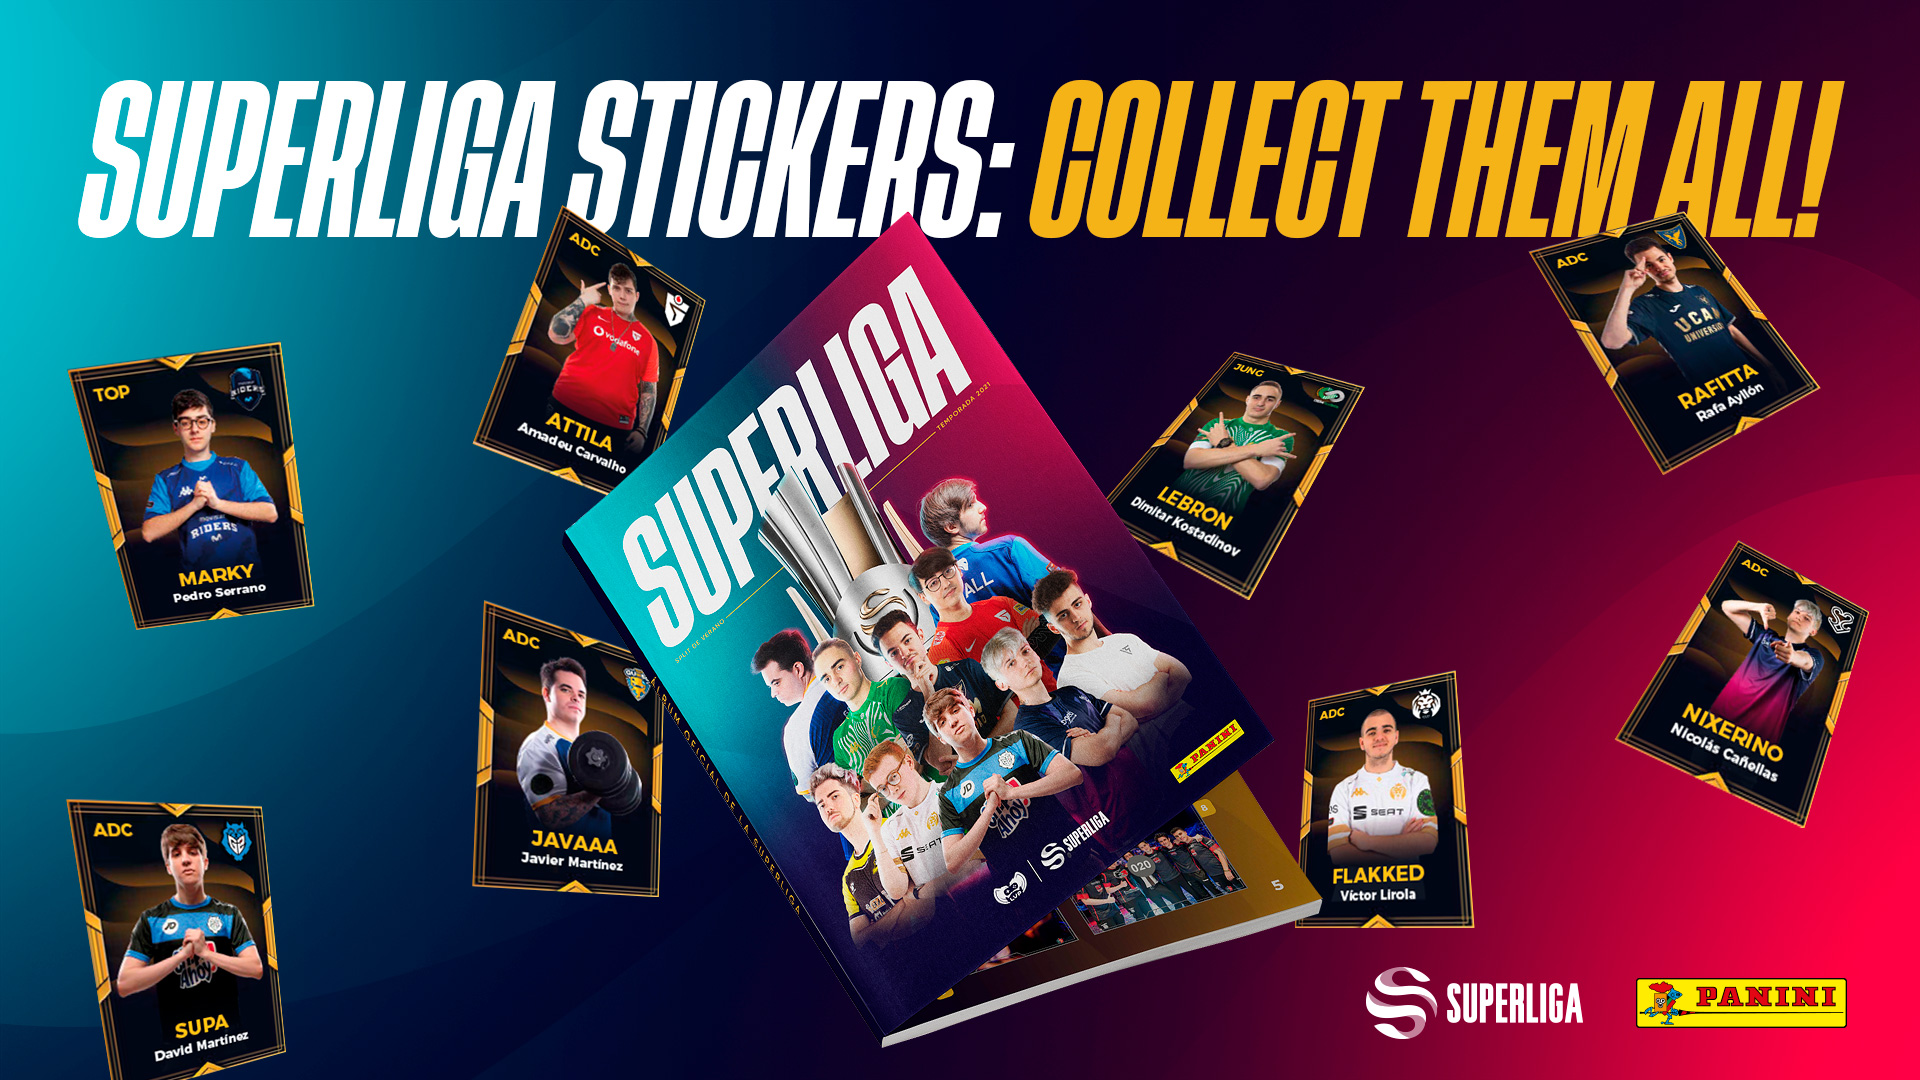 Panini partners with LVP to release Superliga sticker album thumbnail